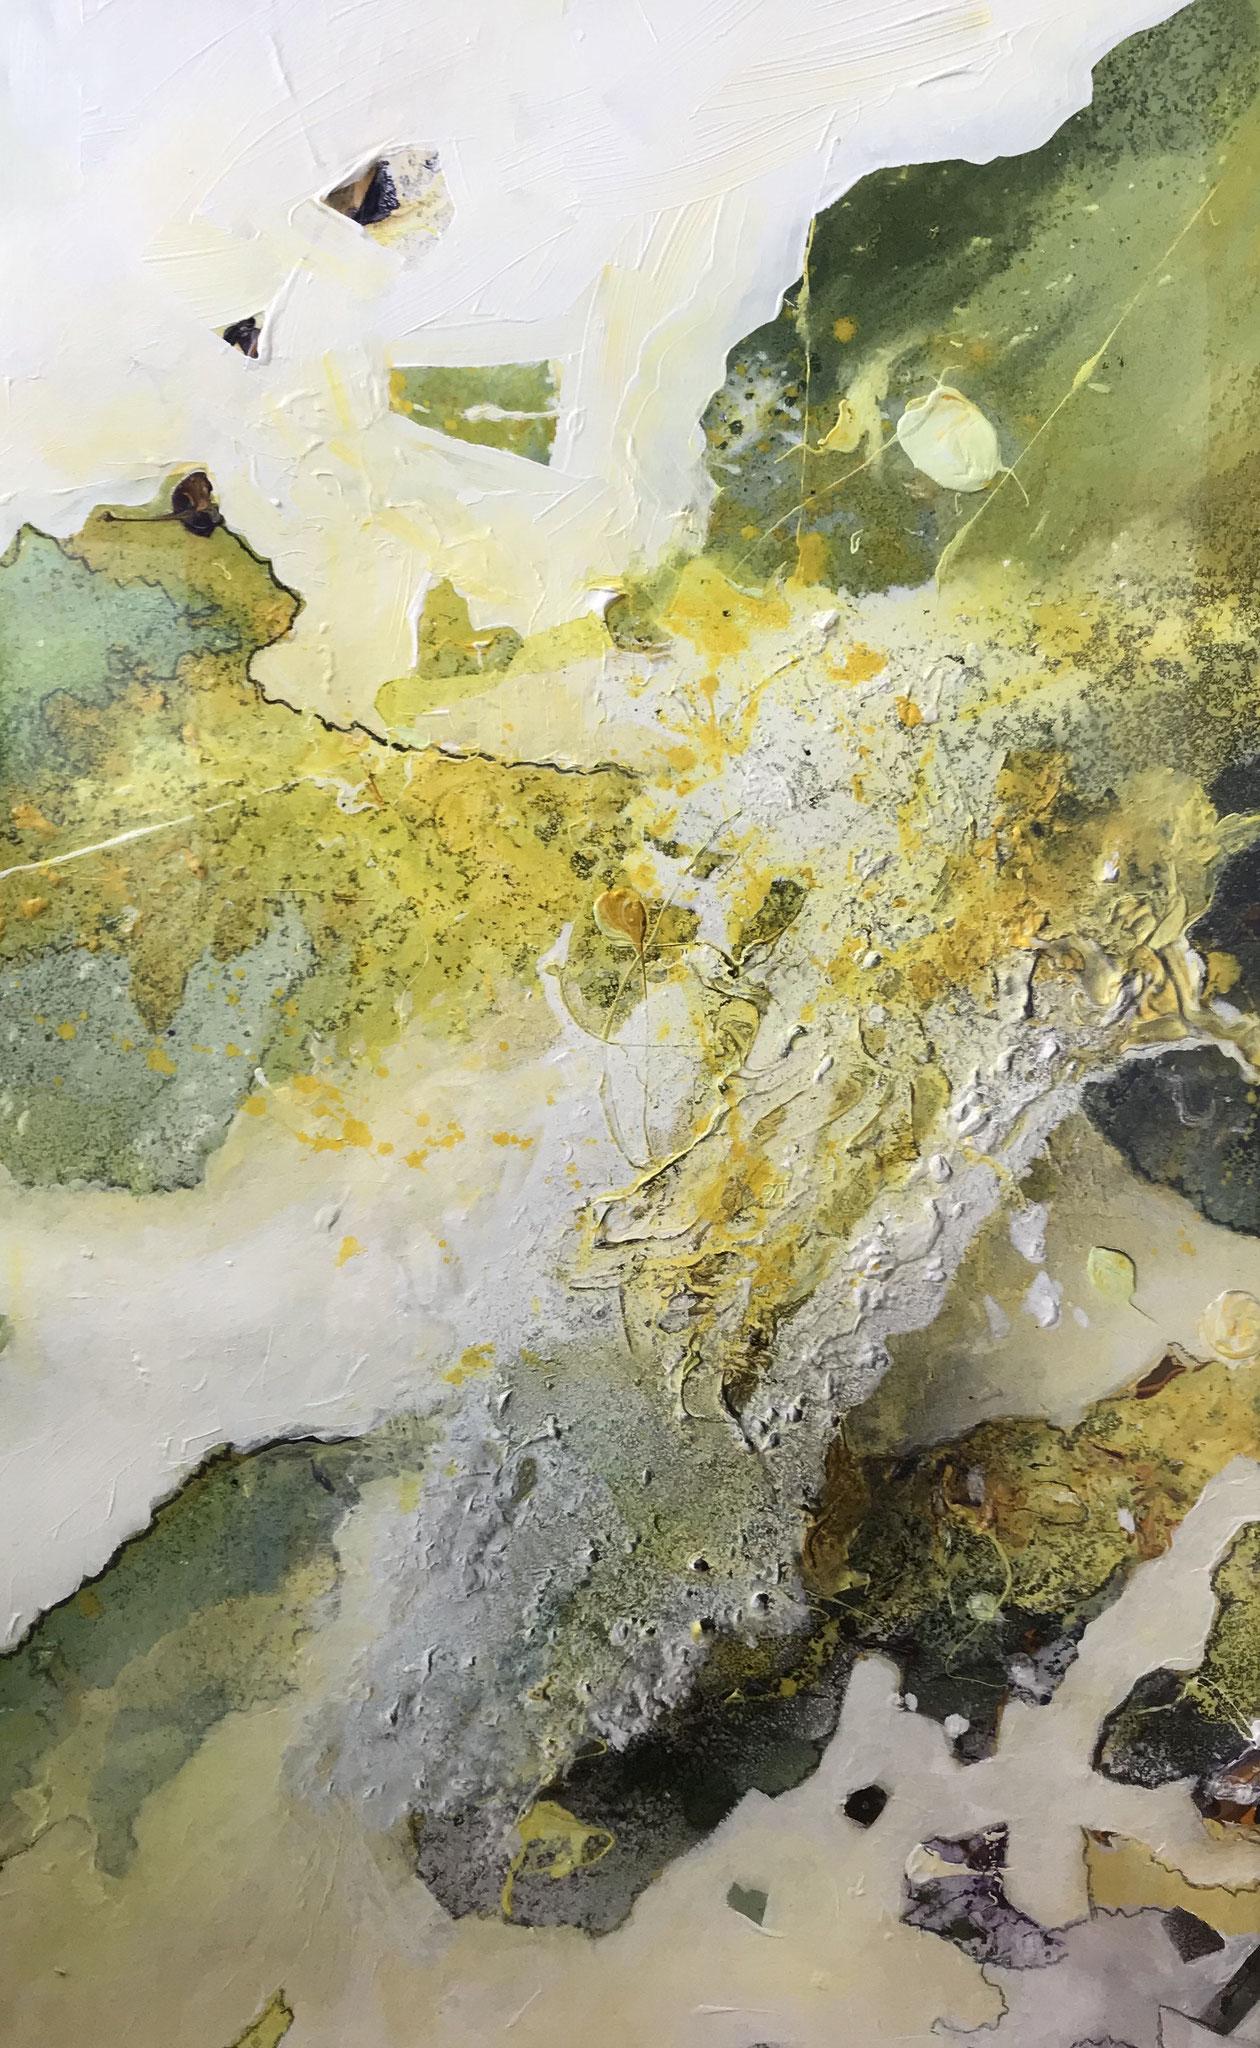 Berge im Eis, Acryl auf Karton, 100 x 80 cm